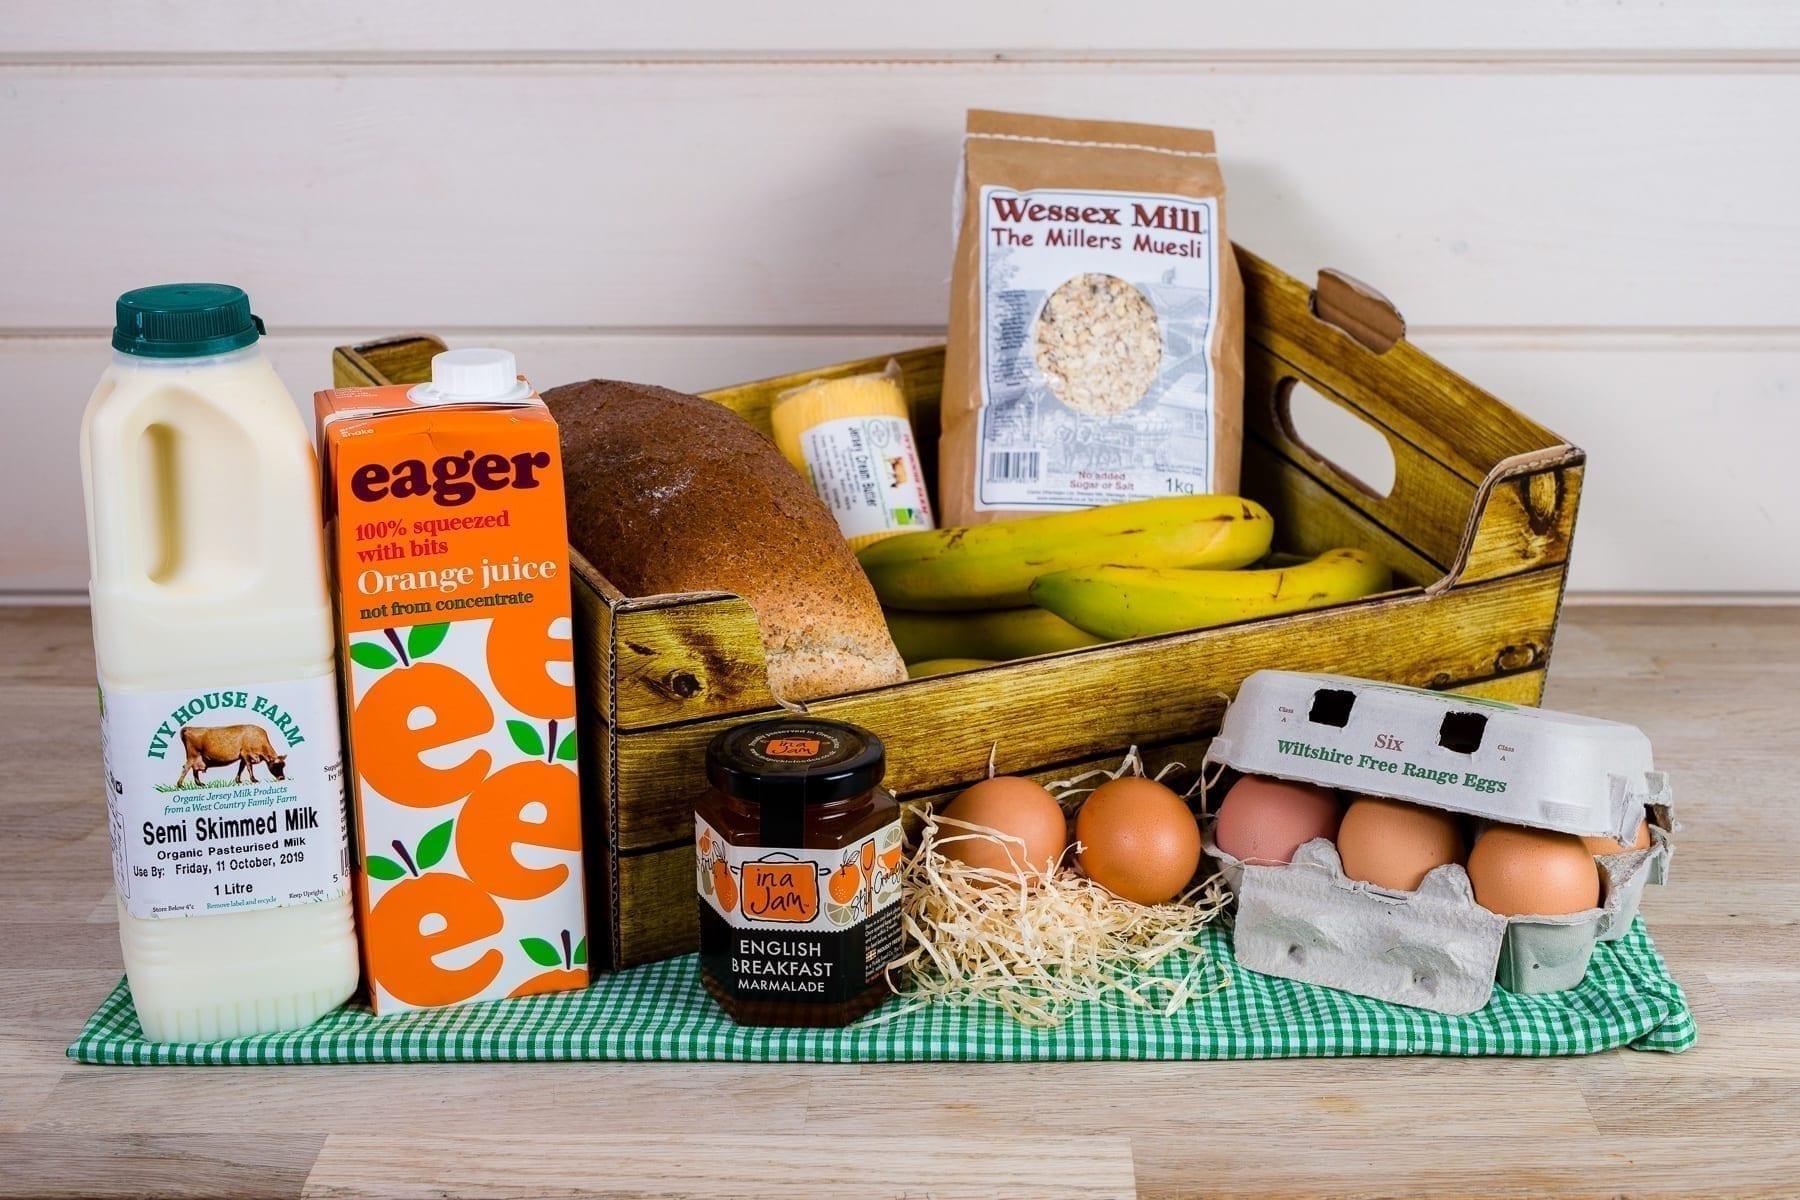 Breakfast essential self-catering box